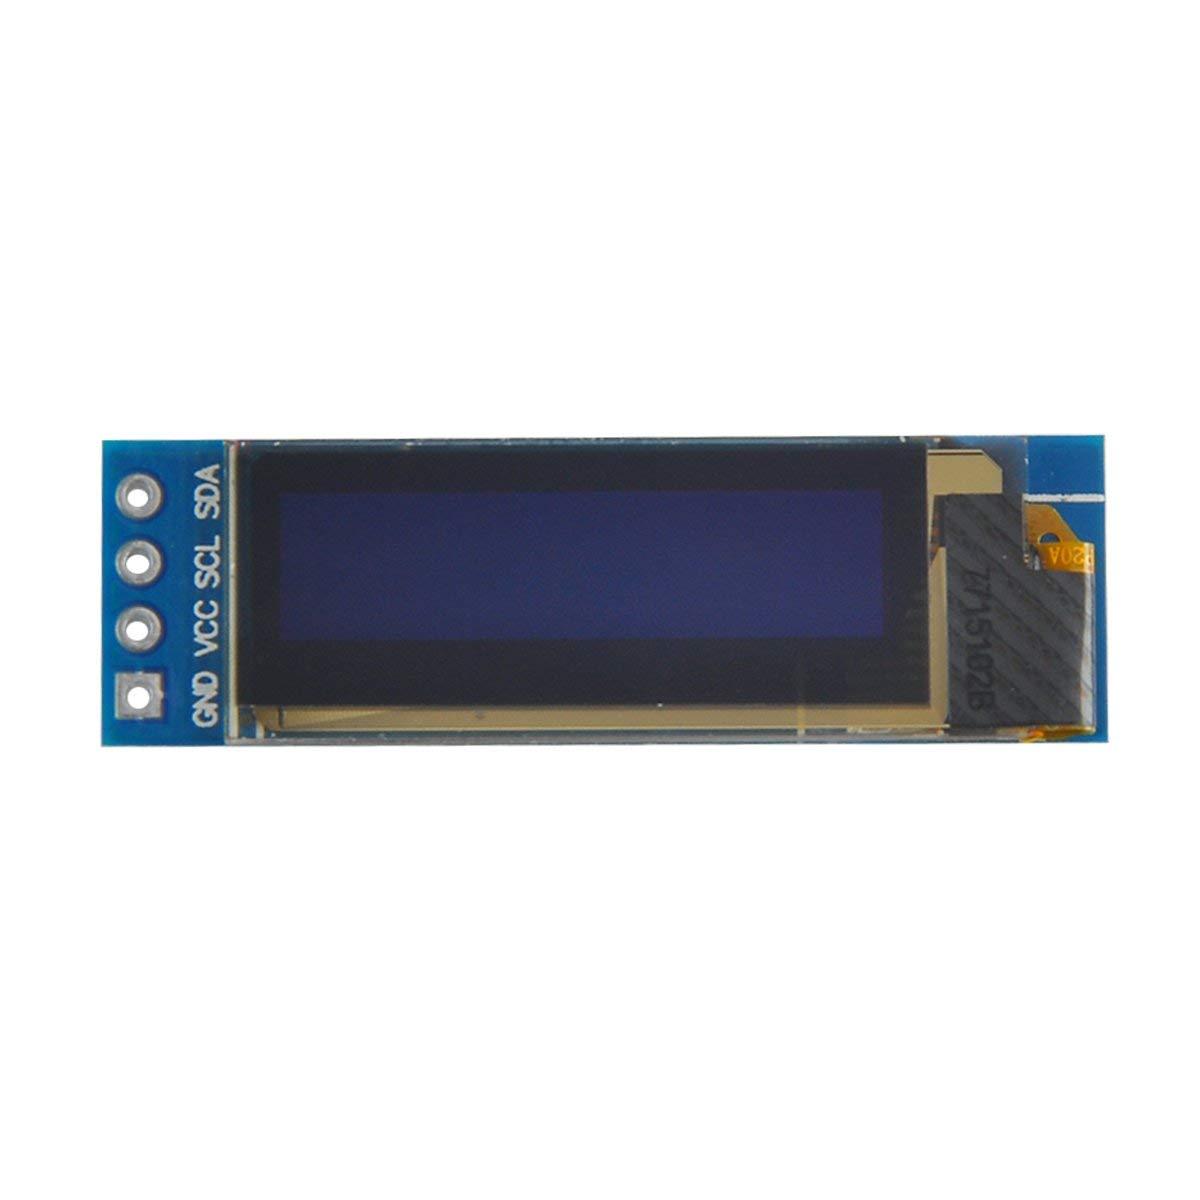 MakerFocus 2pcs I2C OLED Display Module 0 91 Inch I2C